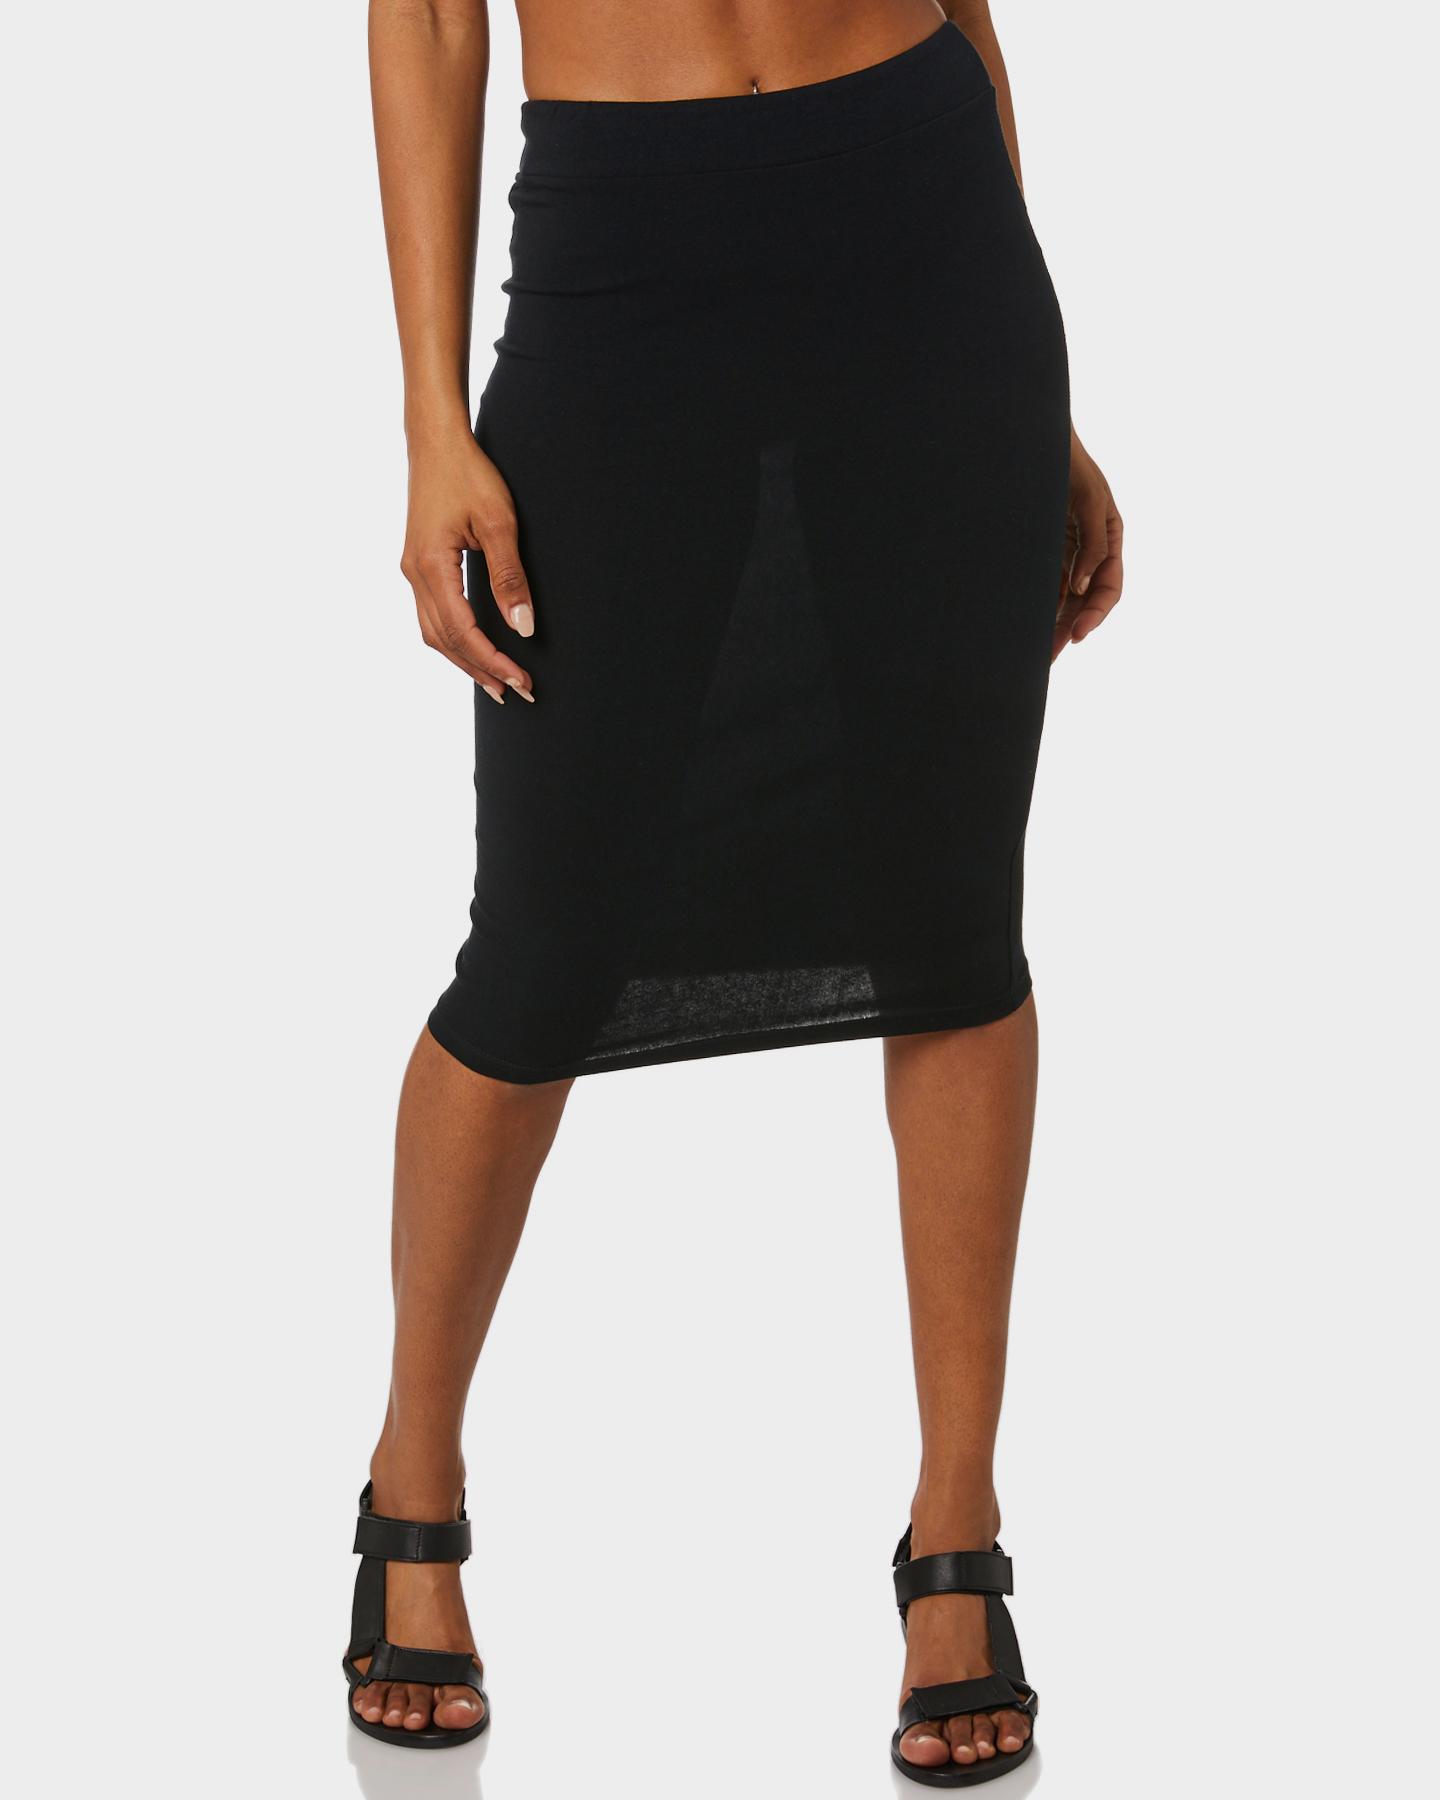 New-Betty-Basics-Women-039-s-Alicia-Midi-Skirt-Cotton-Elastane-Black